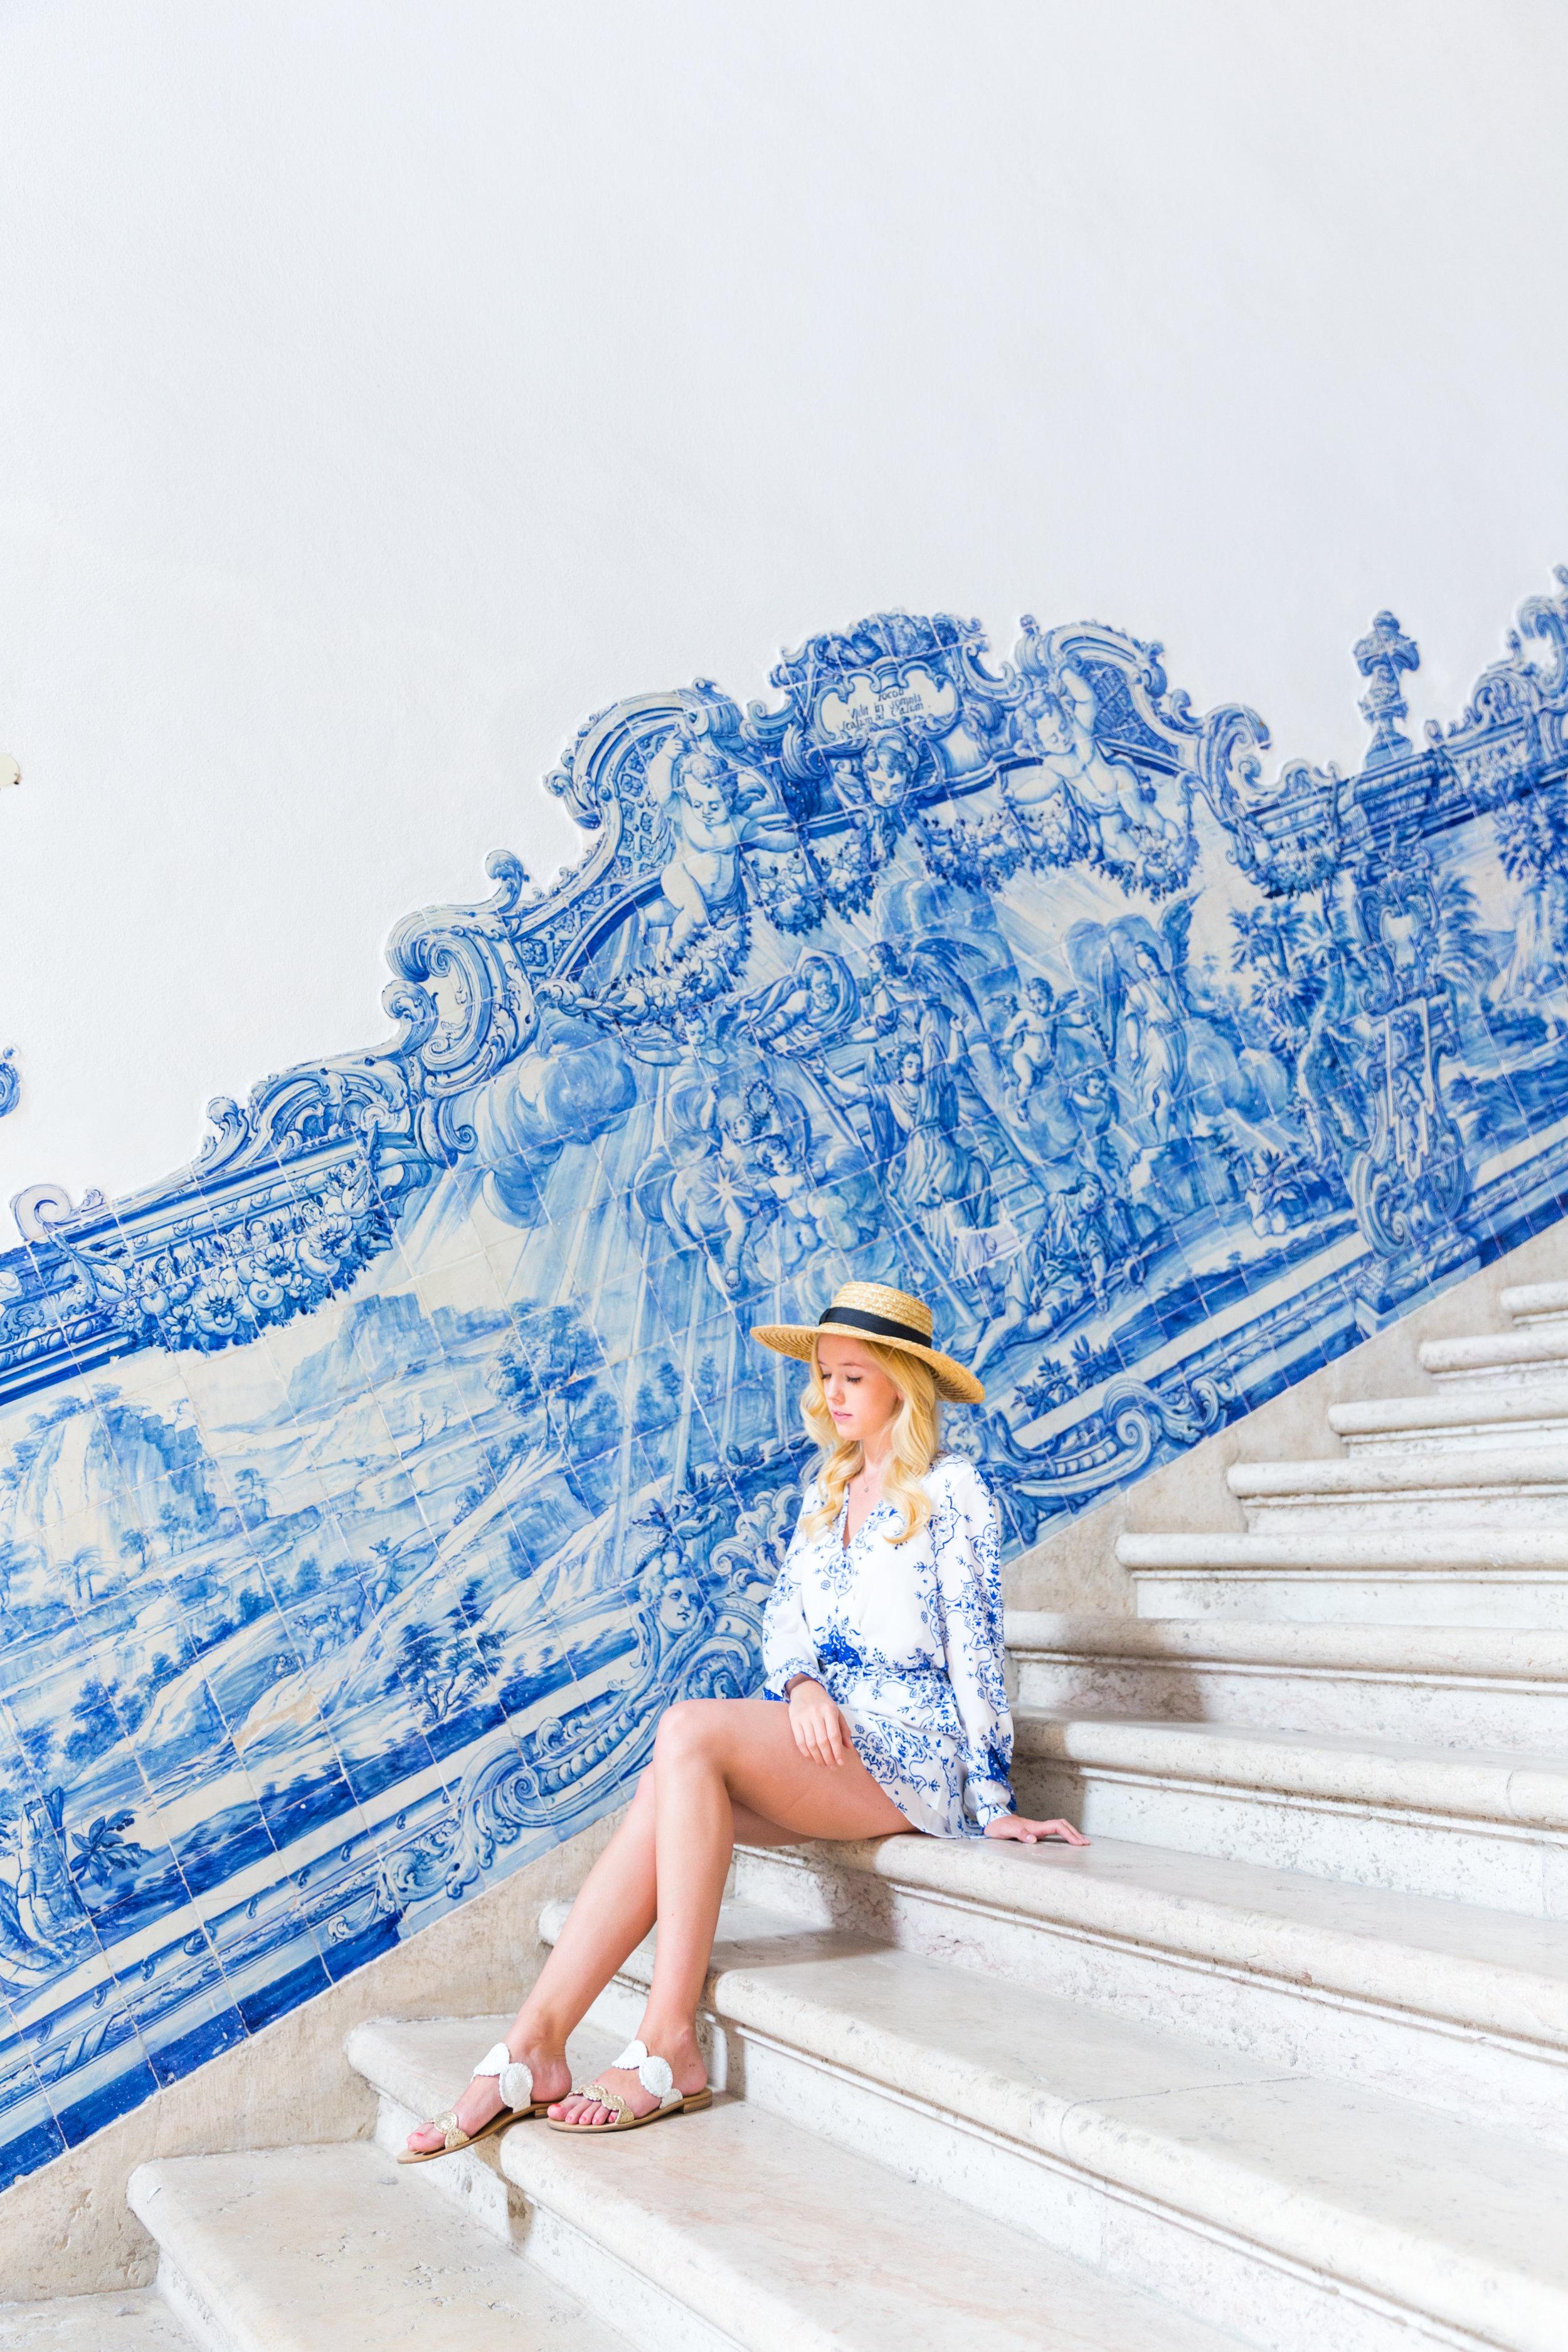 Lisbon Portugal Summer Blue and White Romper Fashion_-5.jpg